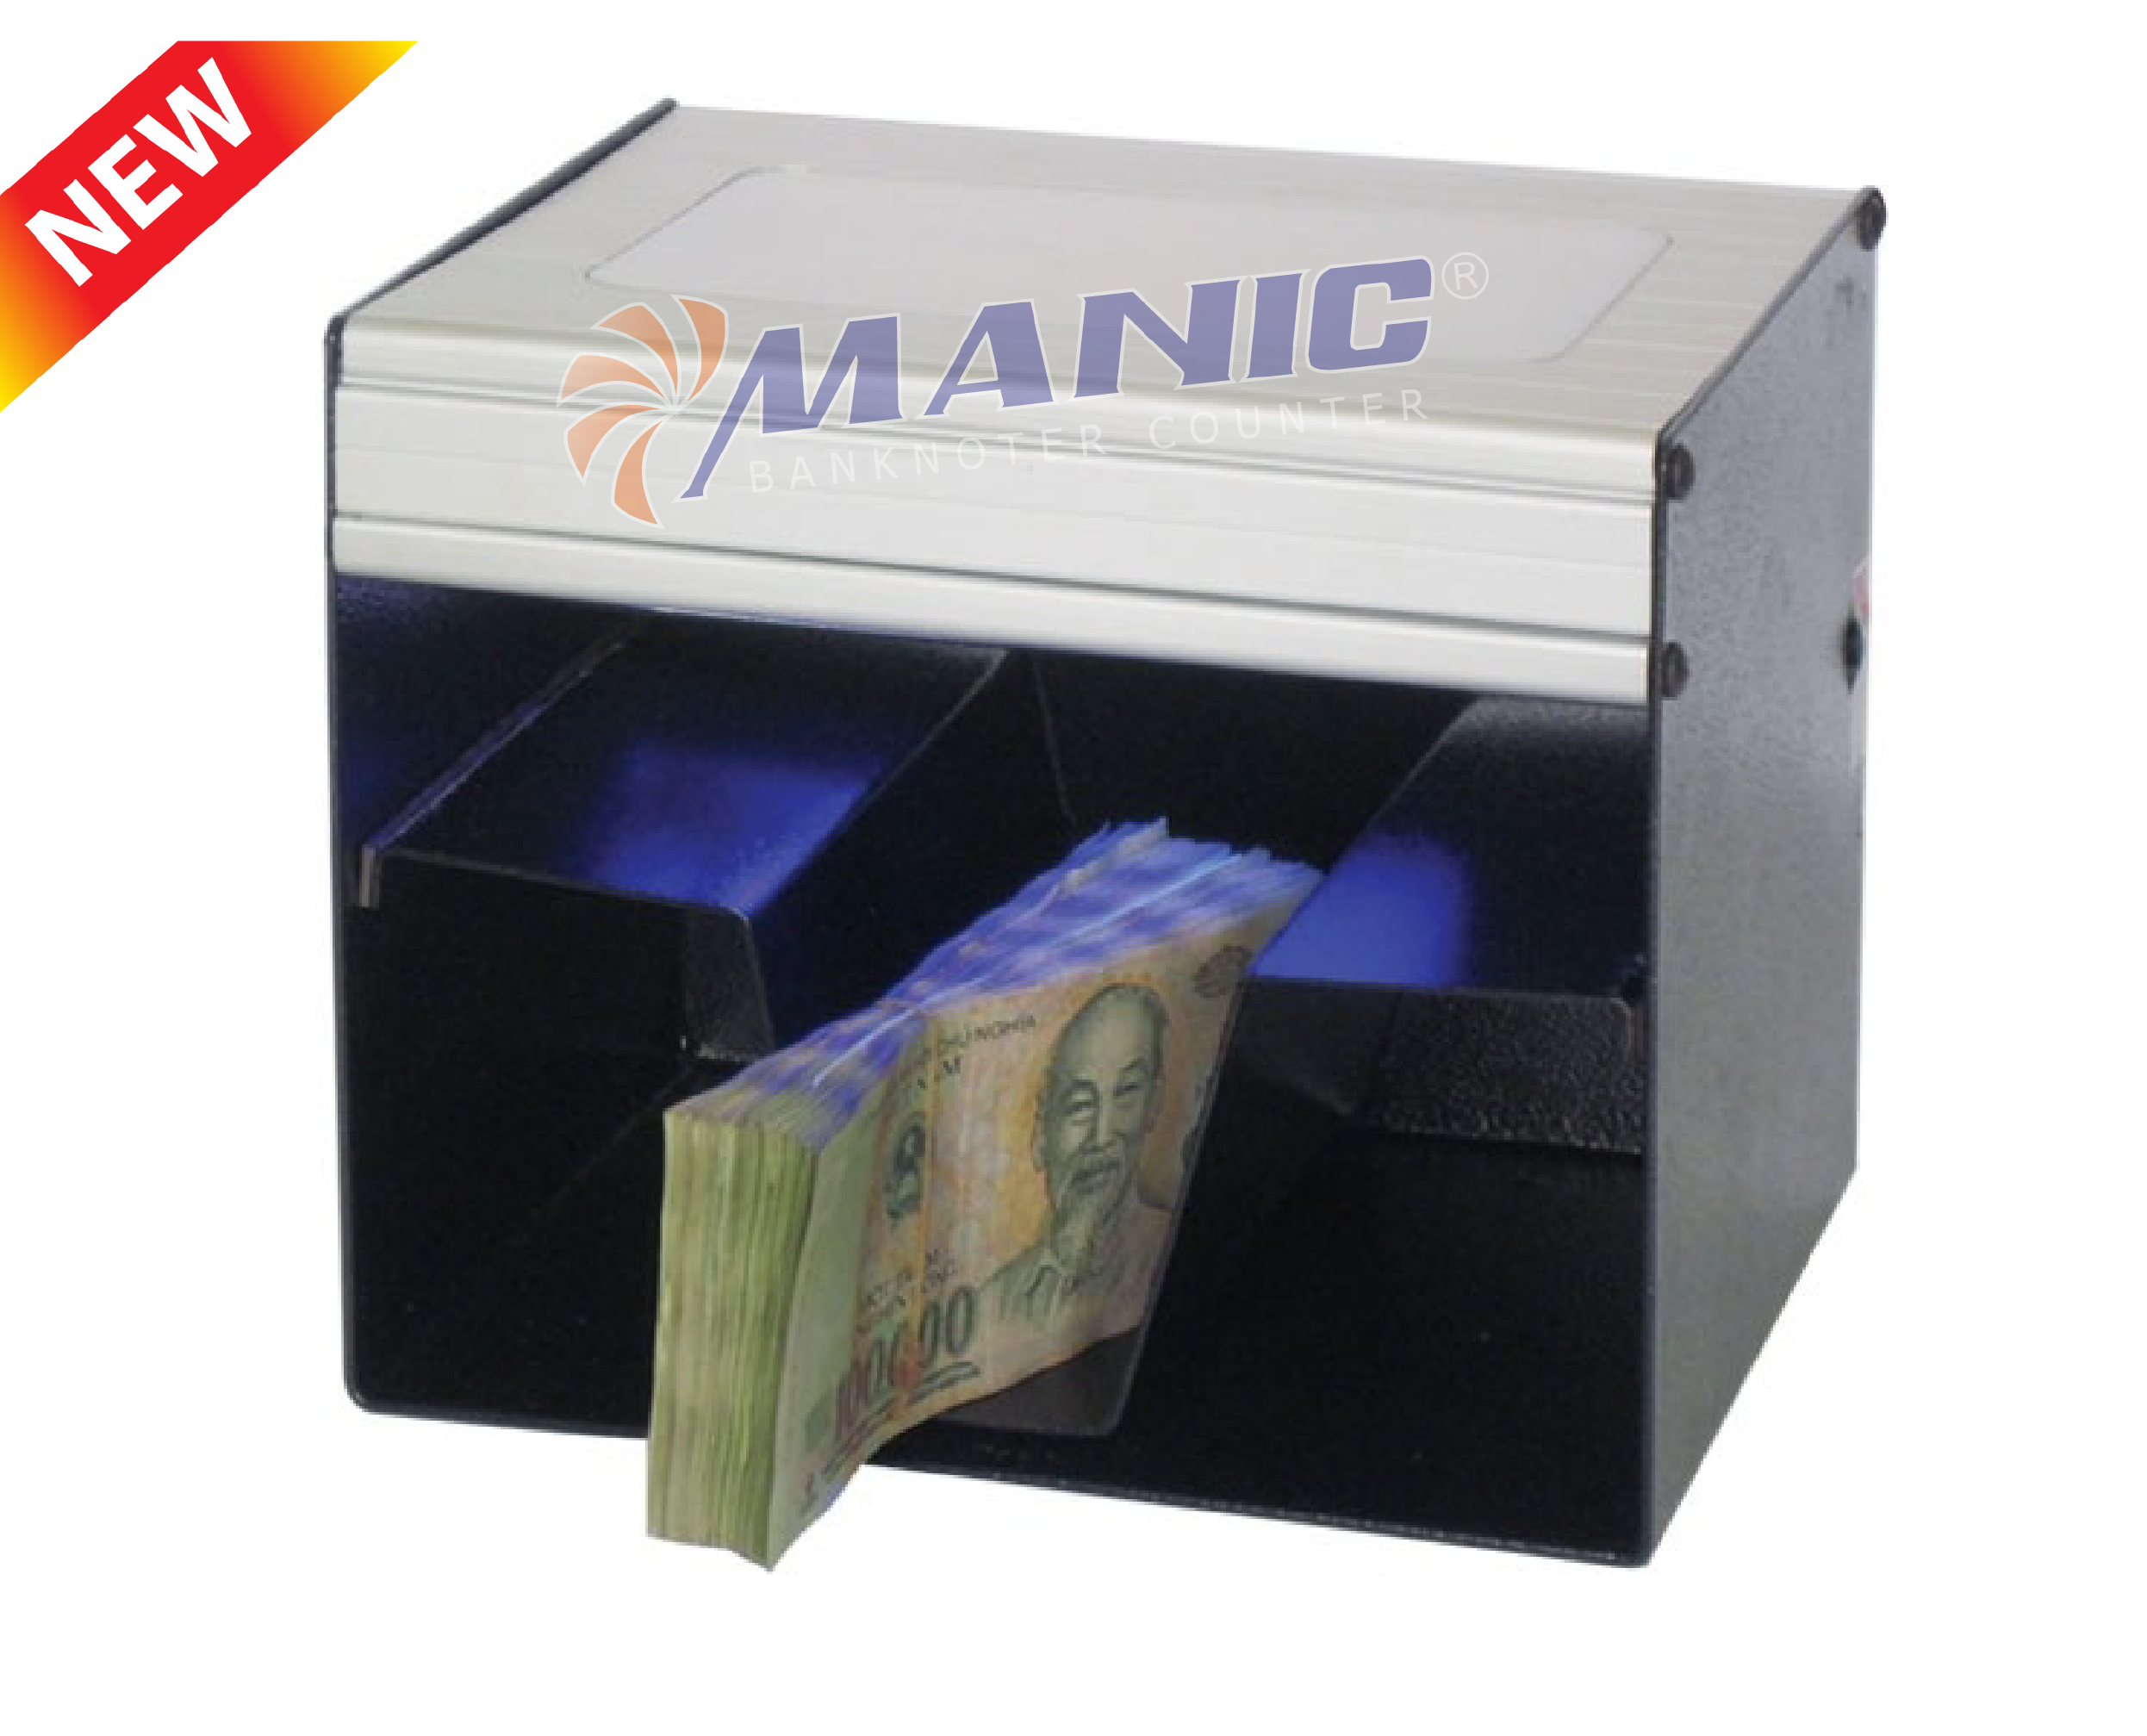 Máy kiểm tra tiền URGUS-ESTI